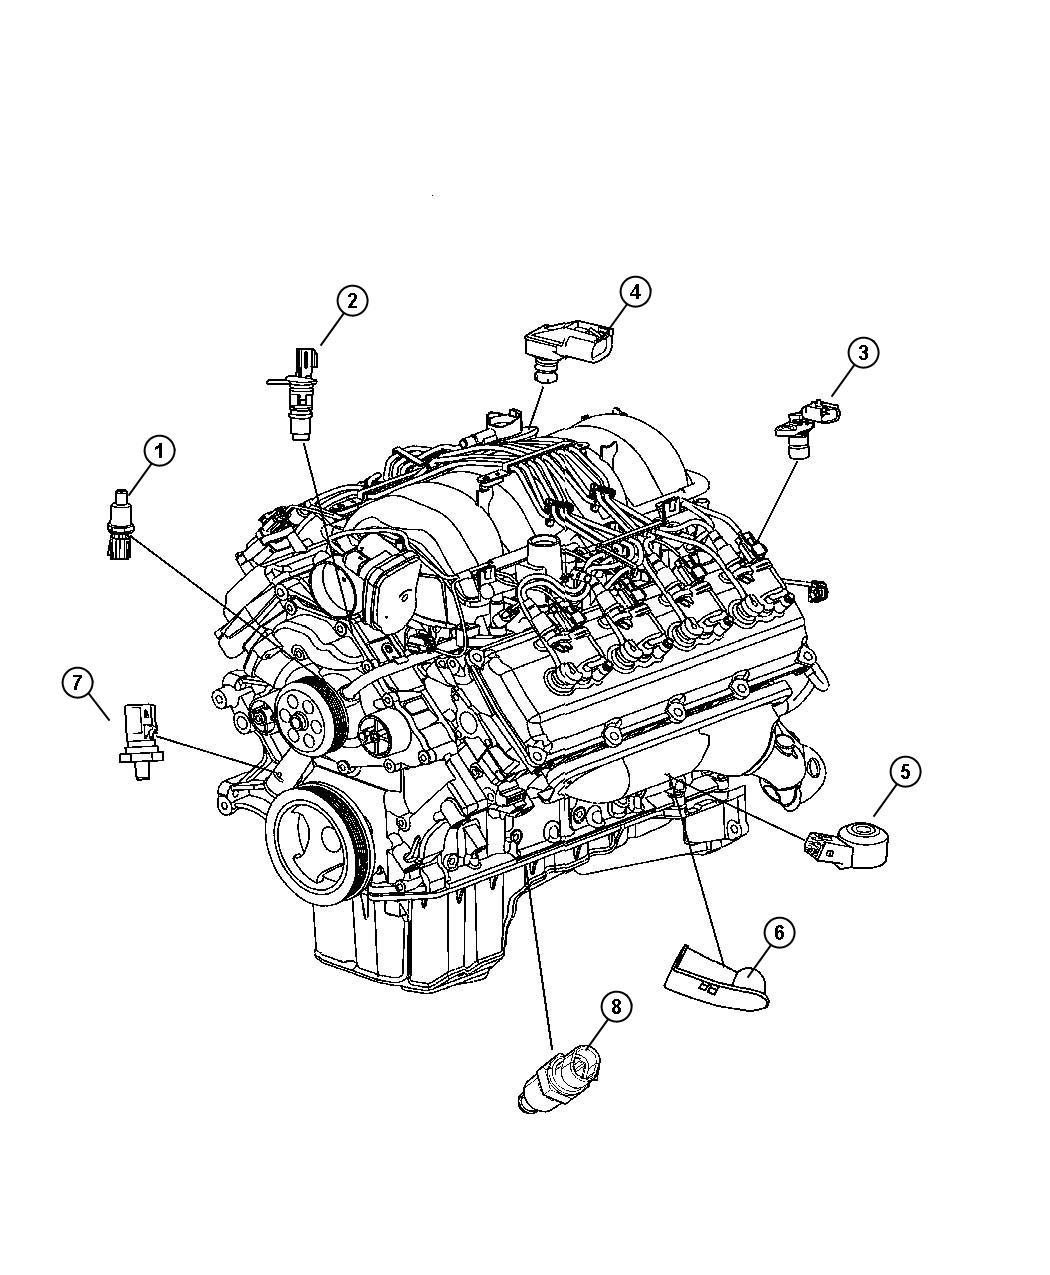 Dodge Challenger R T 5 7l Hemi V8 M T Sending Unit